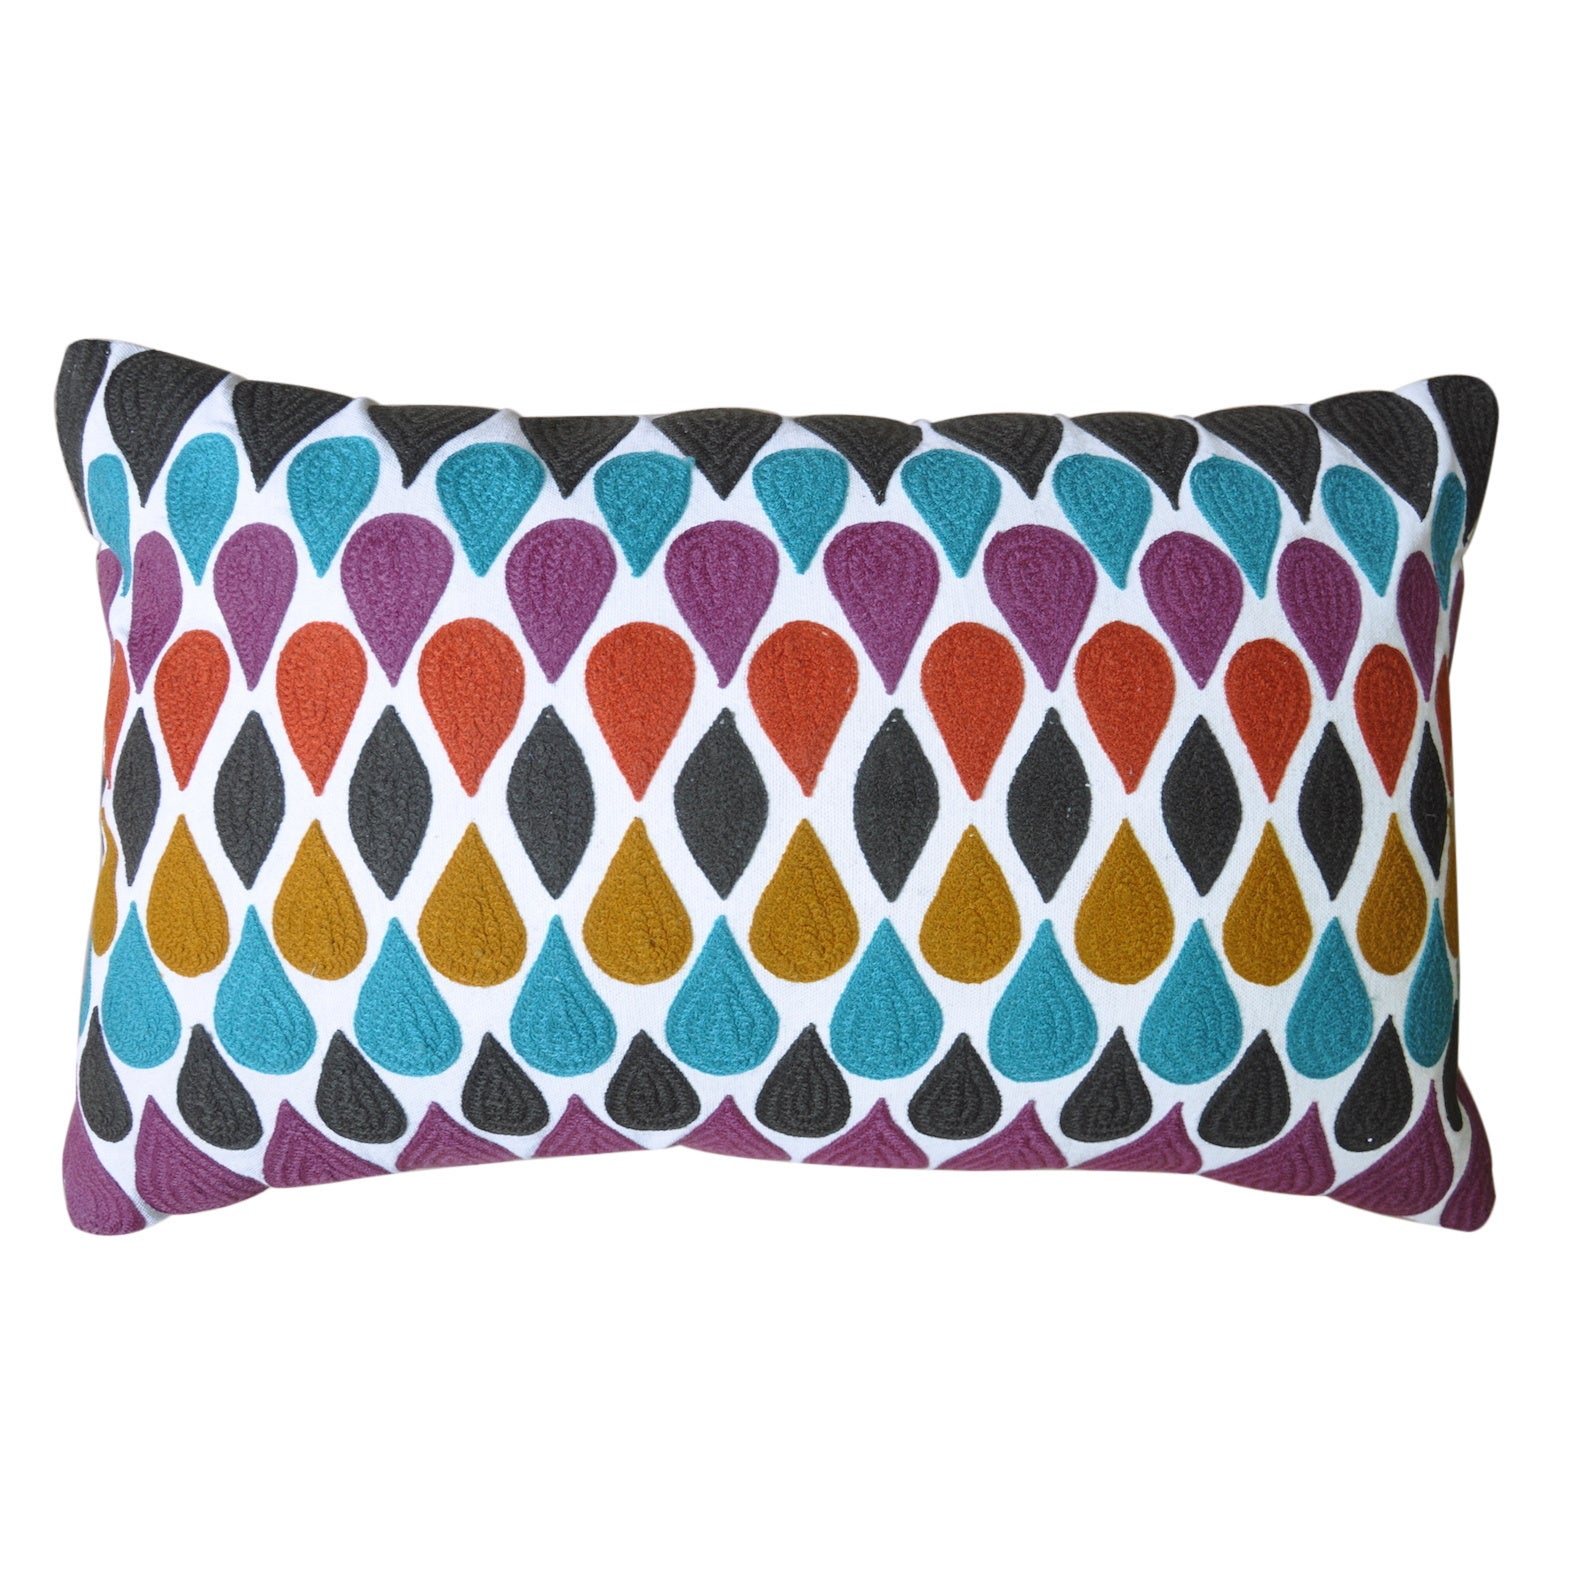 Harley Decorative Throw Pillow (Harley Decorative Pillow)